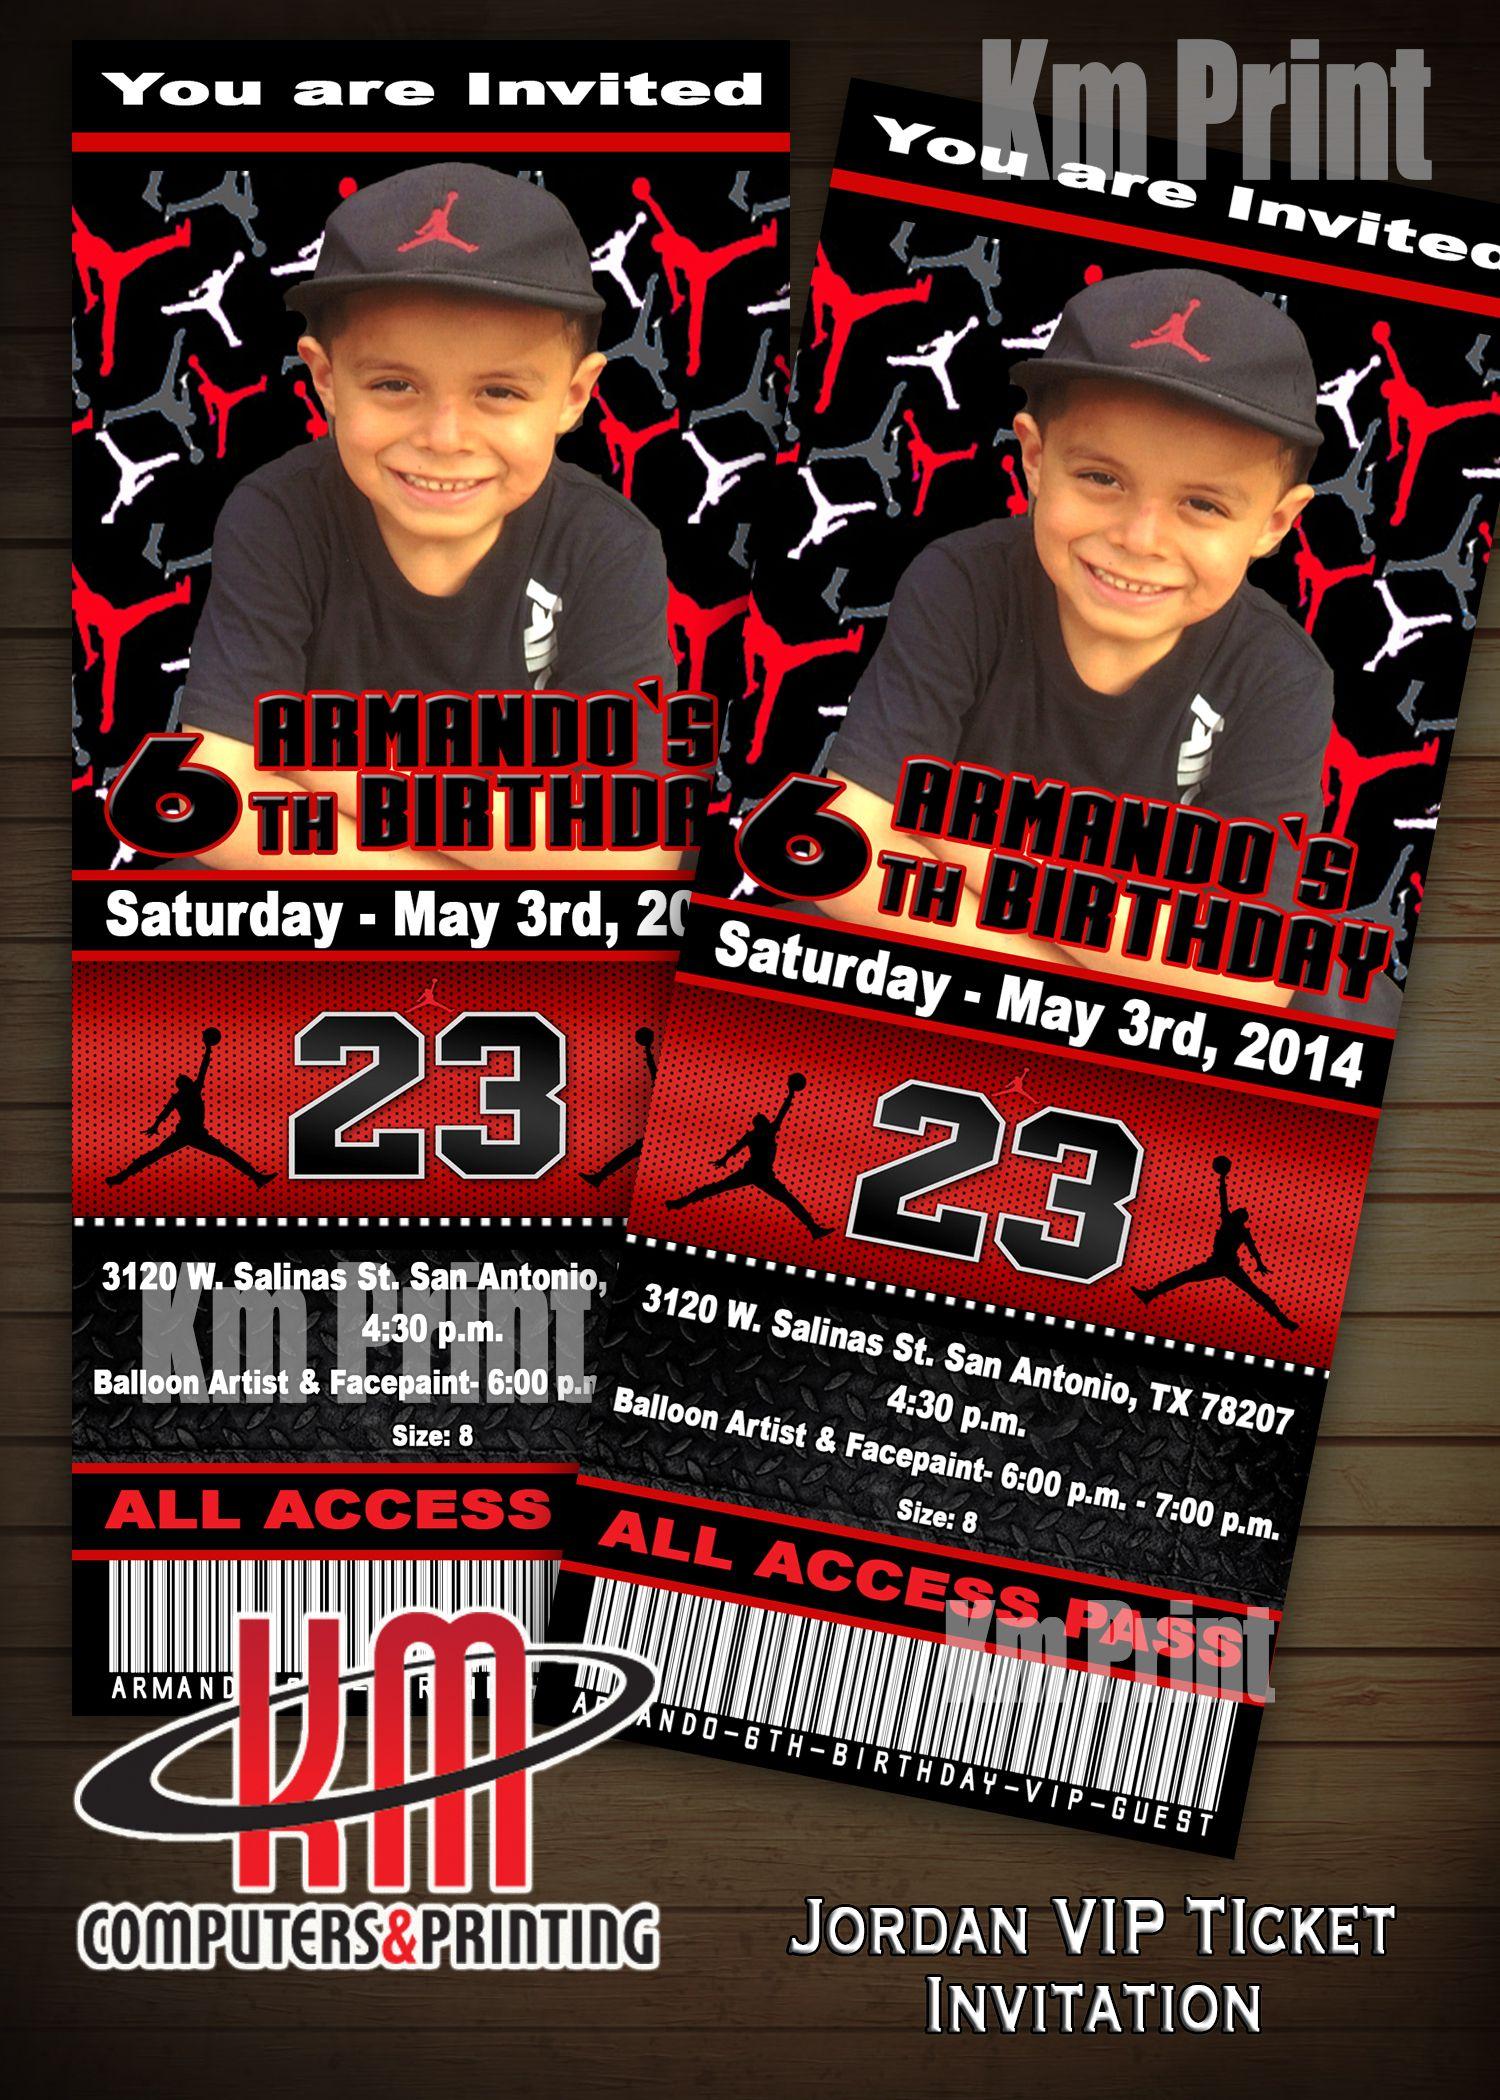 Air Jordan VIP ticket Invitation Size 3x7 Digital u Print 15 or – Michael Jordan Birthday Card